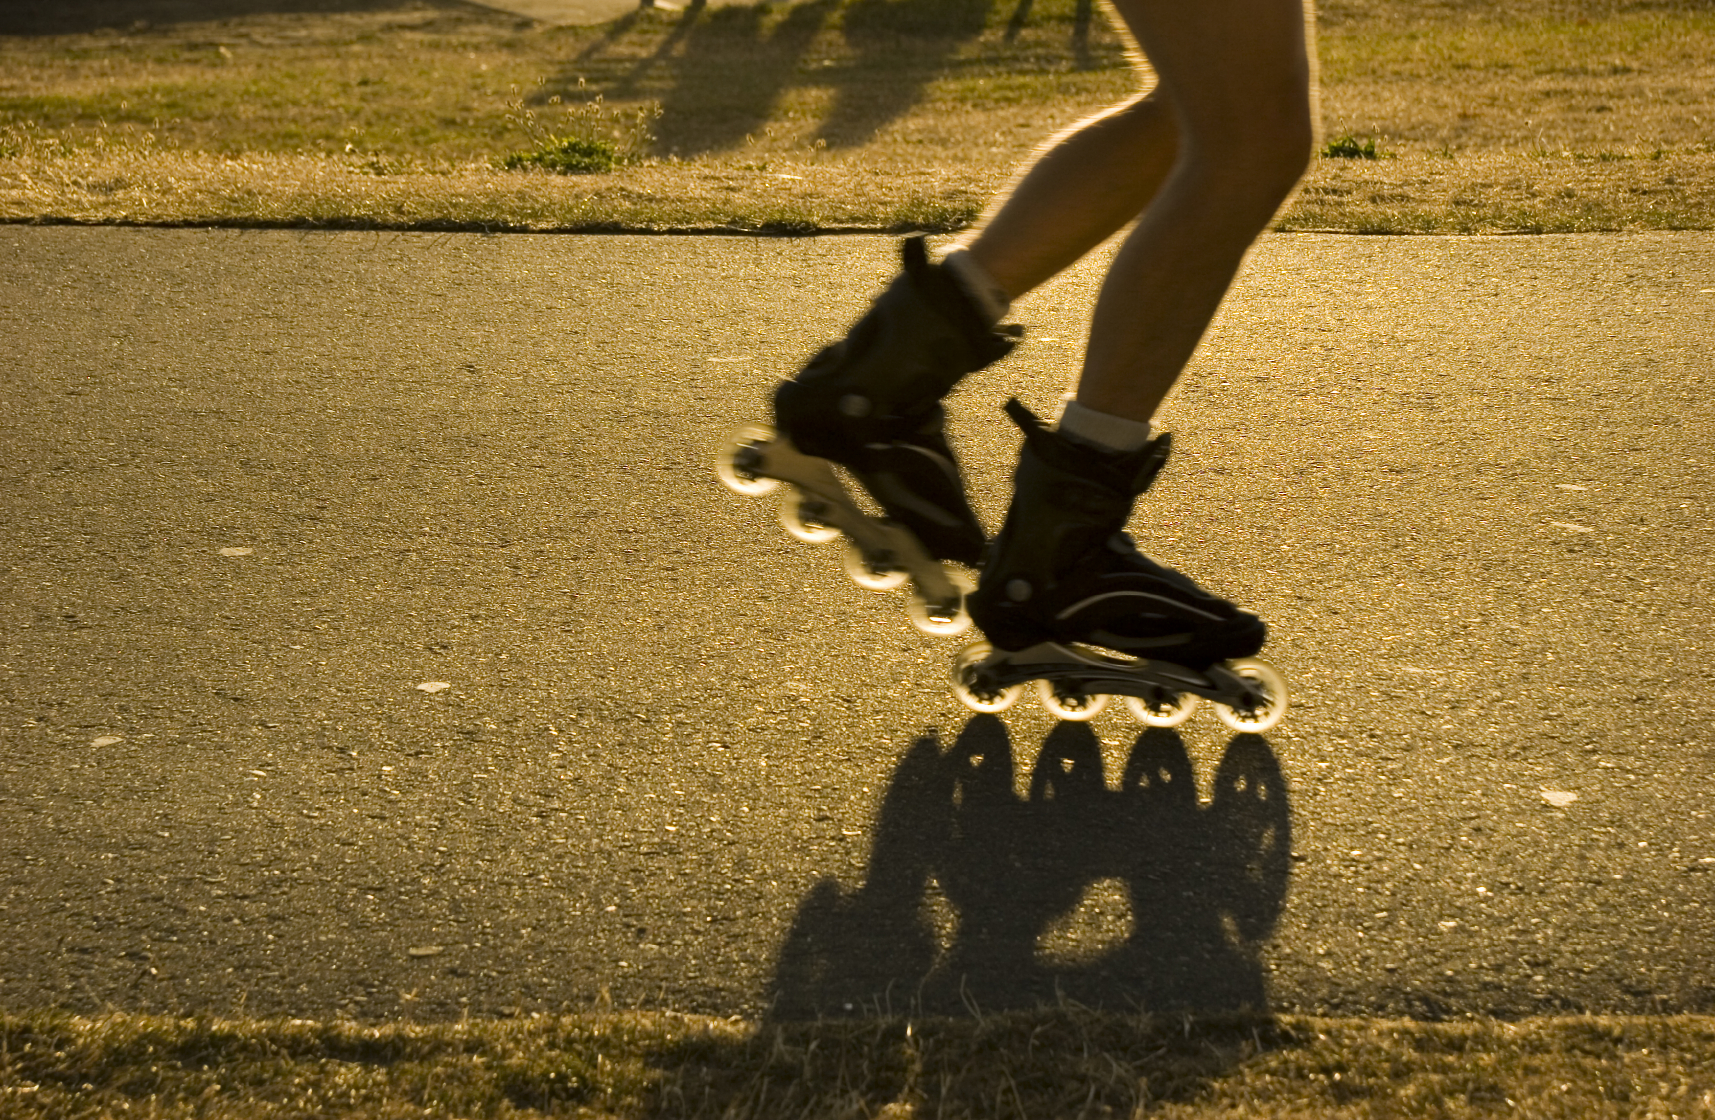 Roller skates one line - Physical Activity Inline Skating Istock_000002117950medium